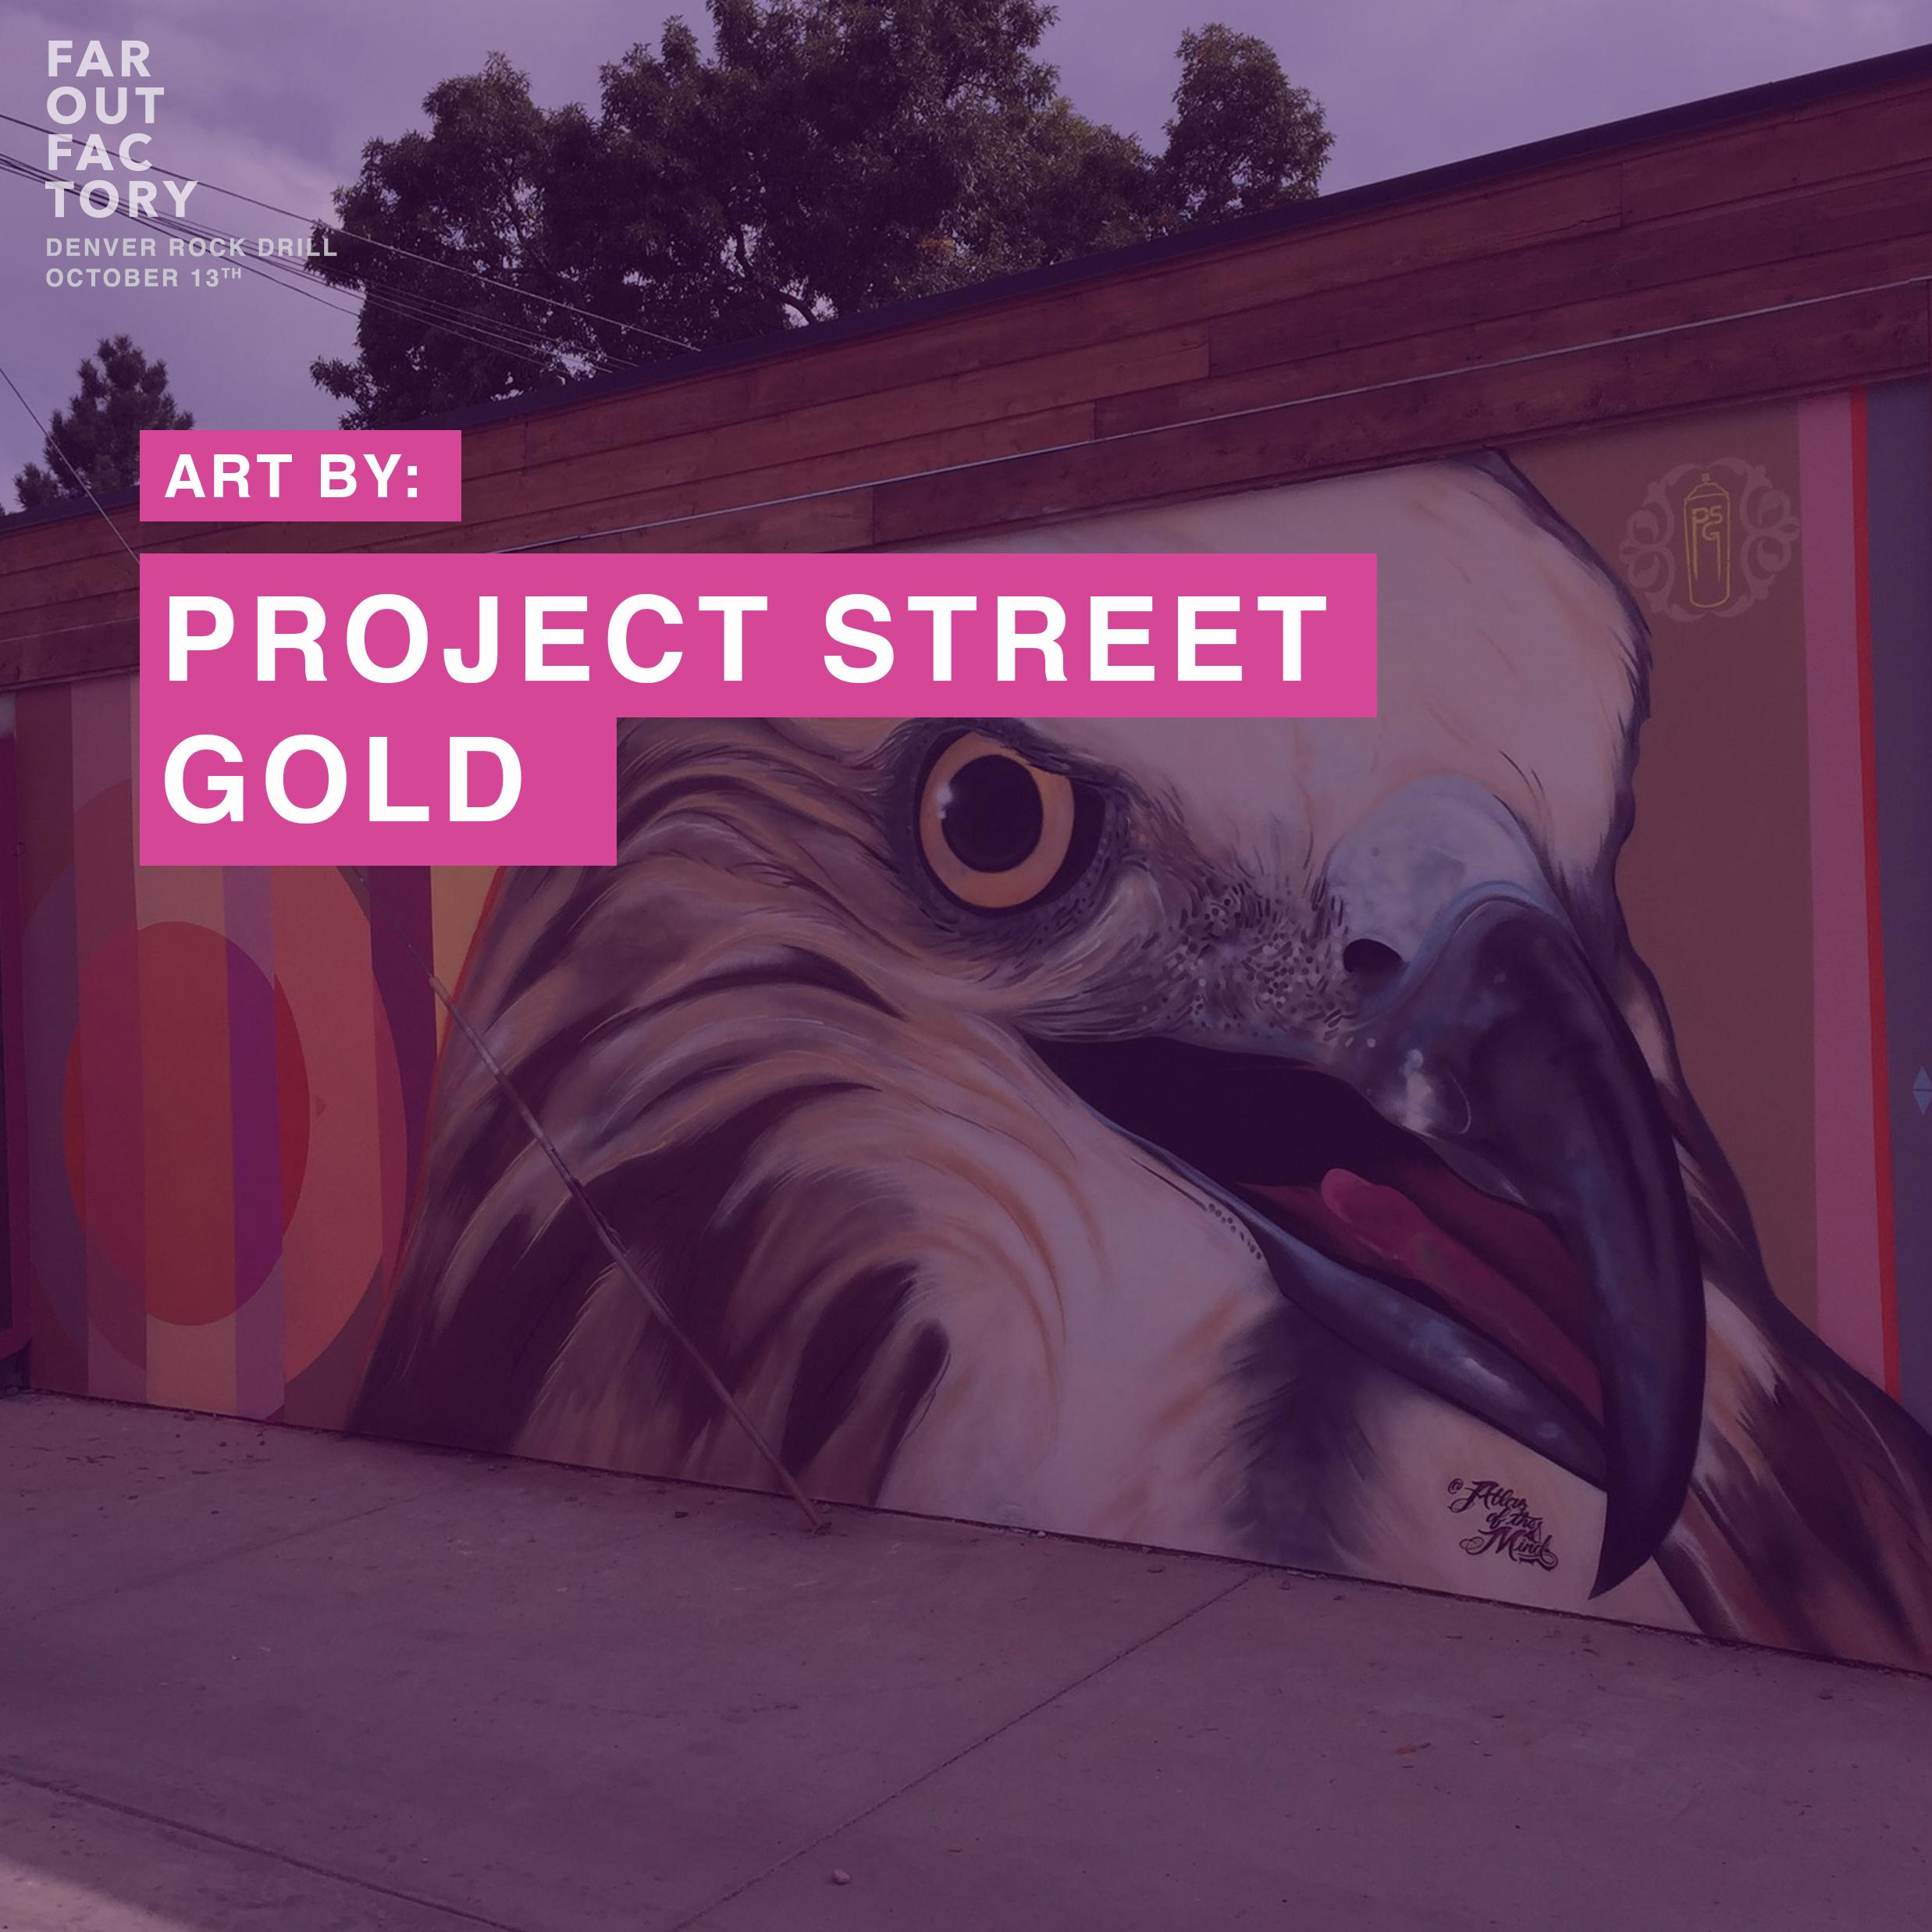 FOF_Art_ProjectStreetGold.jpg